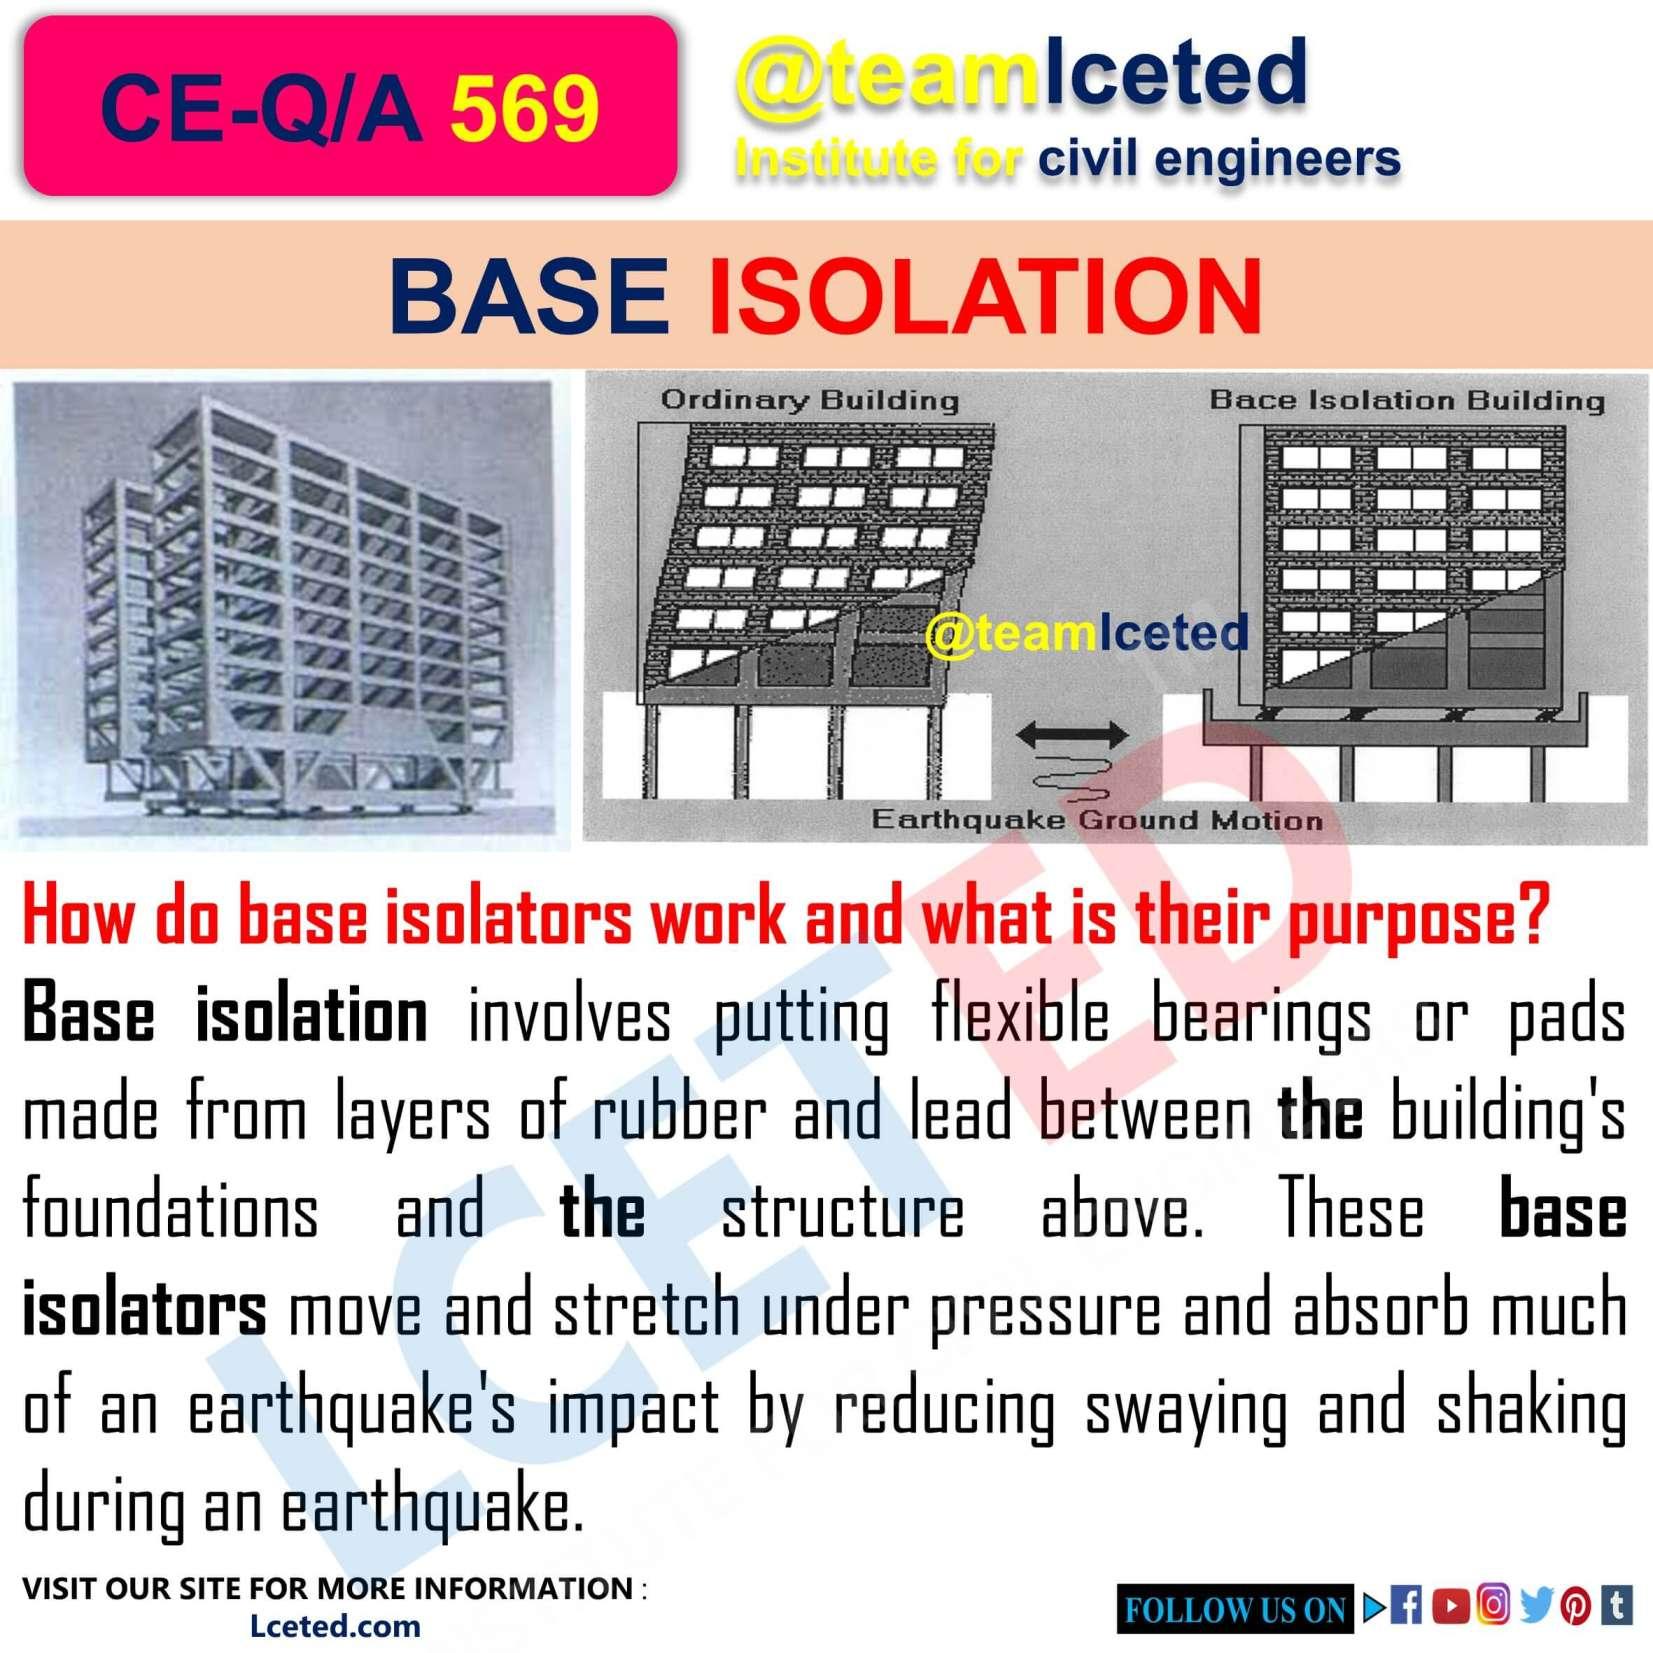 How do base isolators work